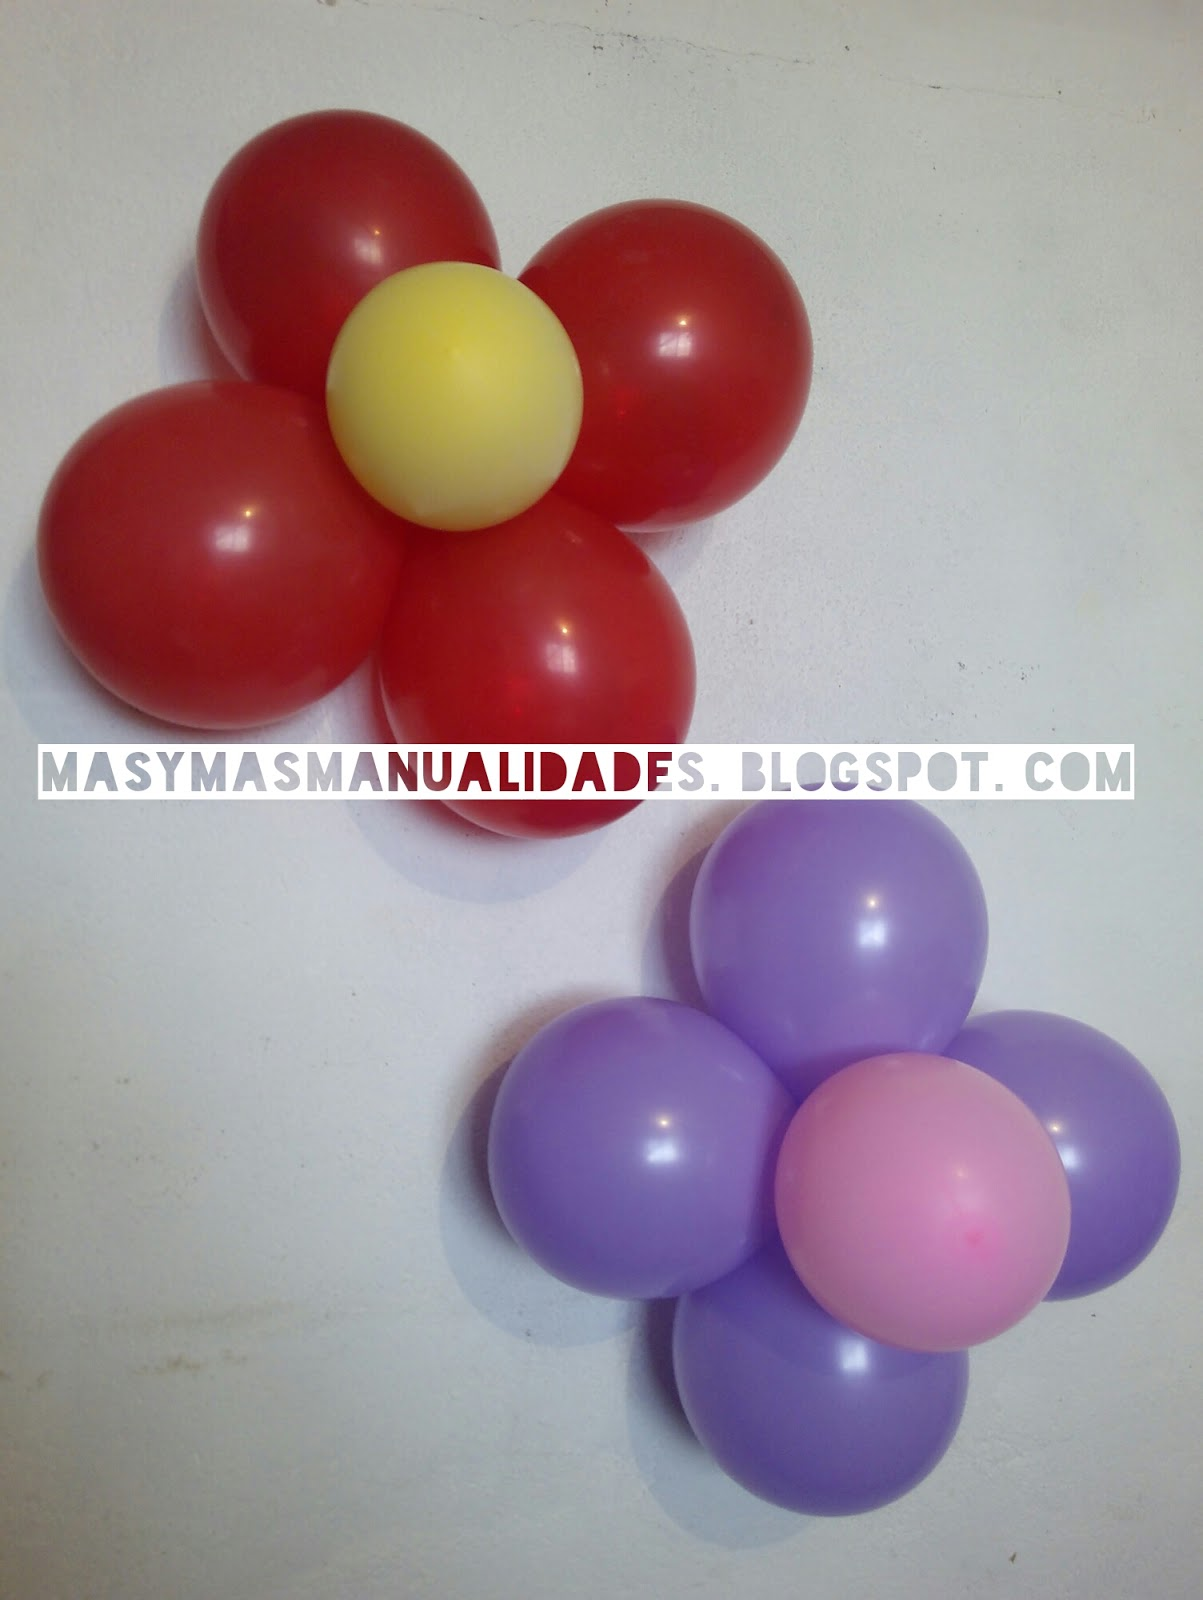 Como Hacer Flores Con Globos - Como-hacer-flores-de-globos